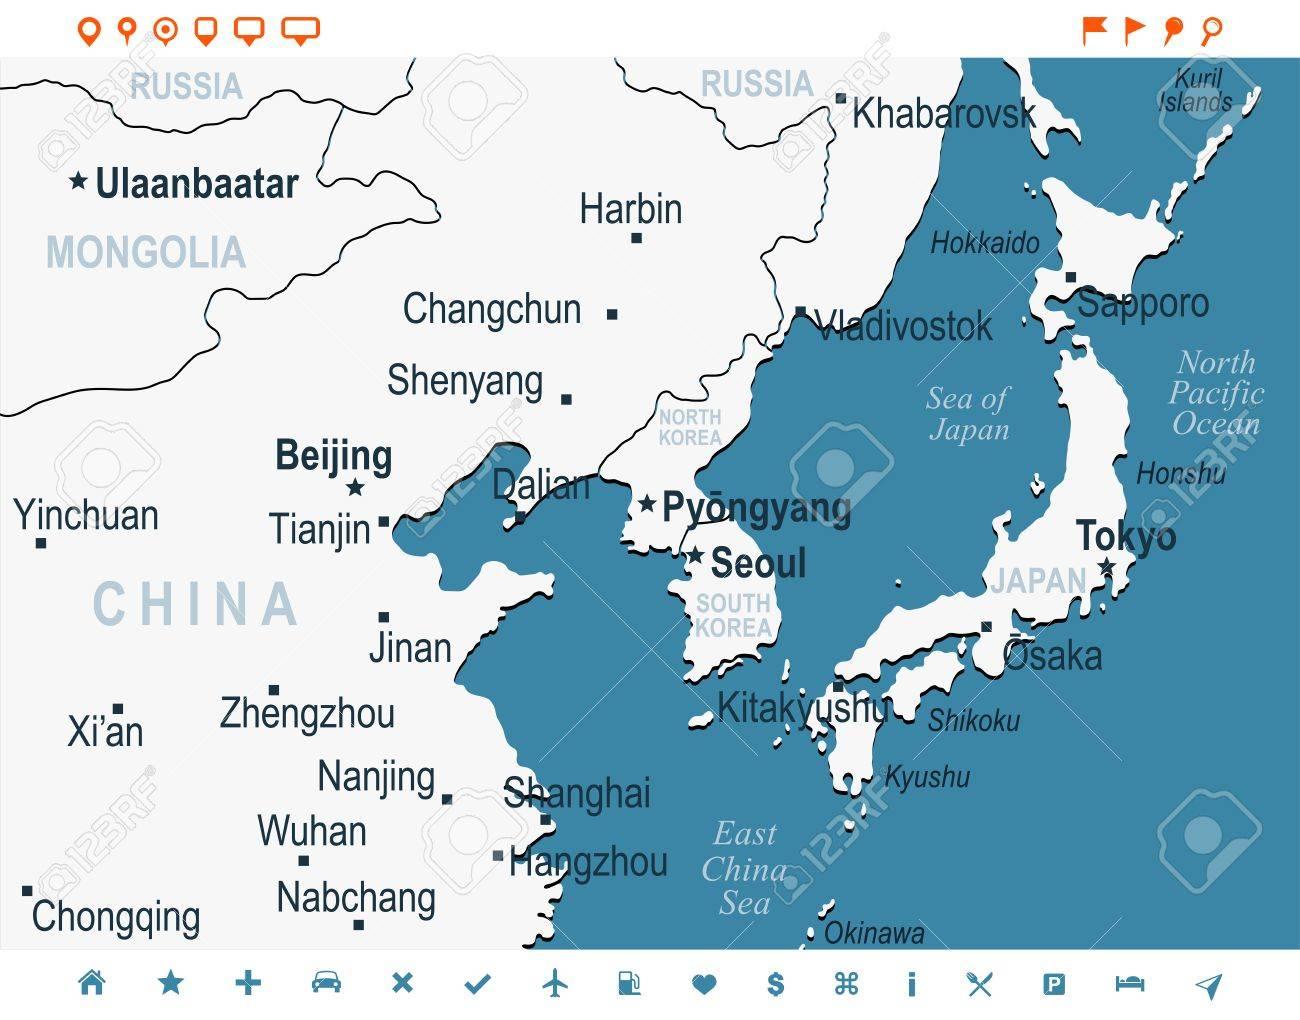 North Korea South Korea Japan China Russia Mongolia Map - Detailed ...